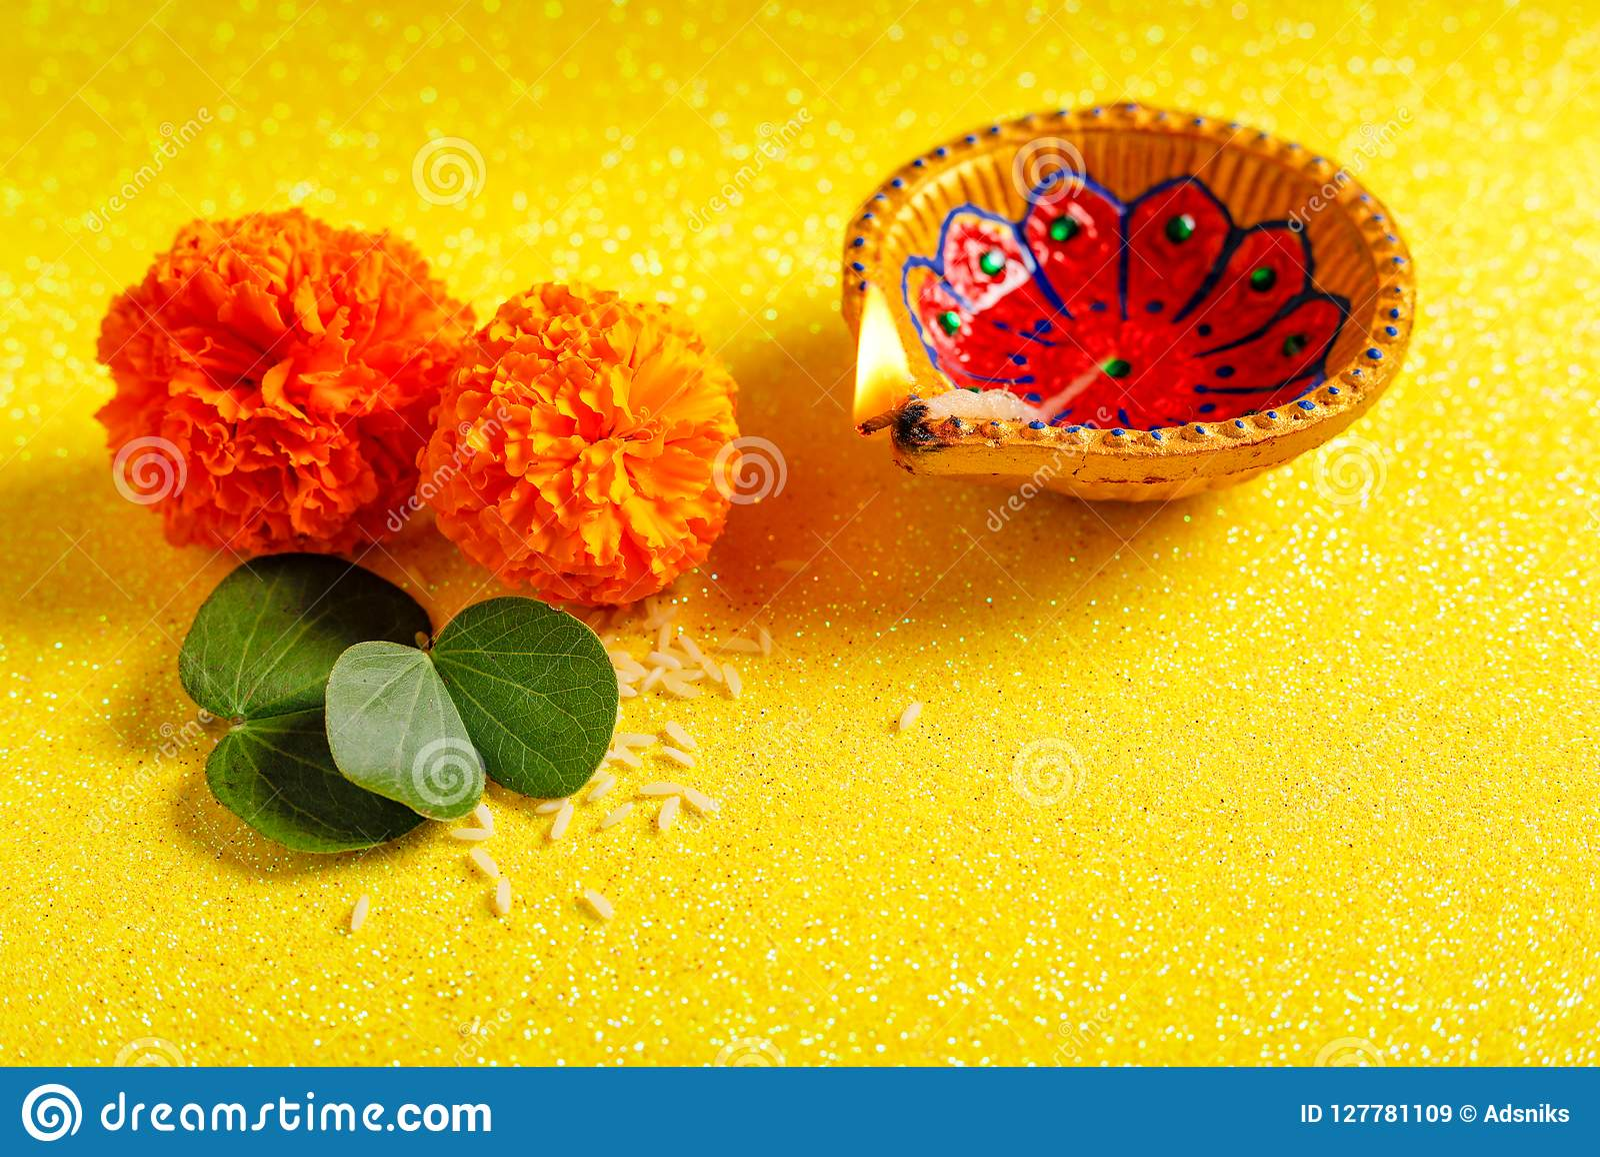 Happy dussehra greeting card green leaf stock image image of happy dussehra greeting card green leaf m4hsunfo